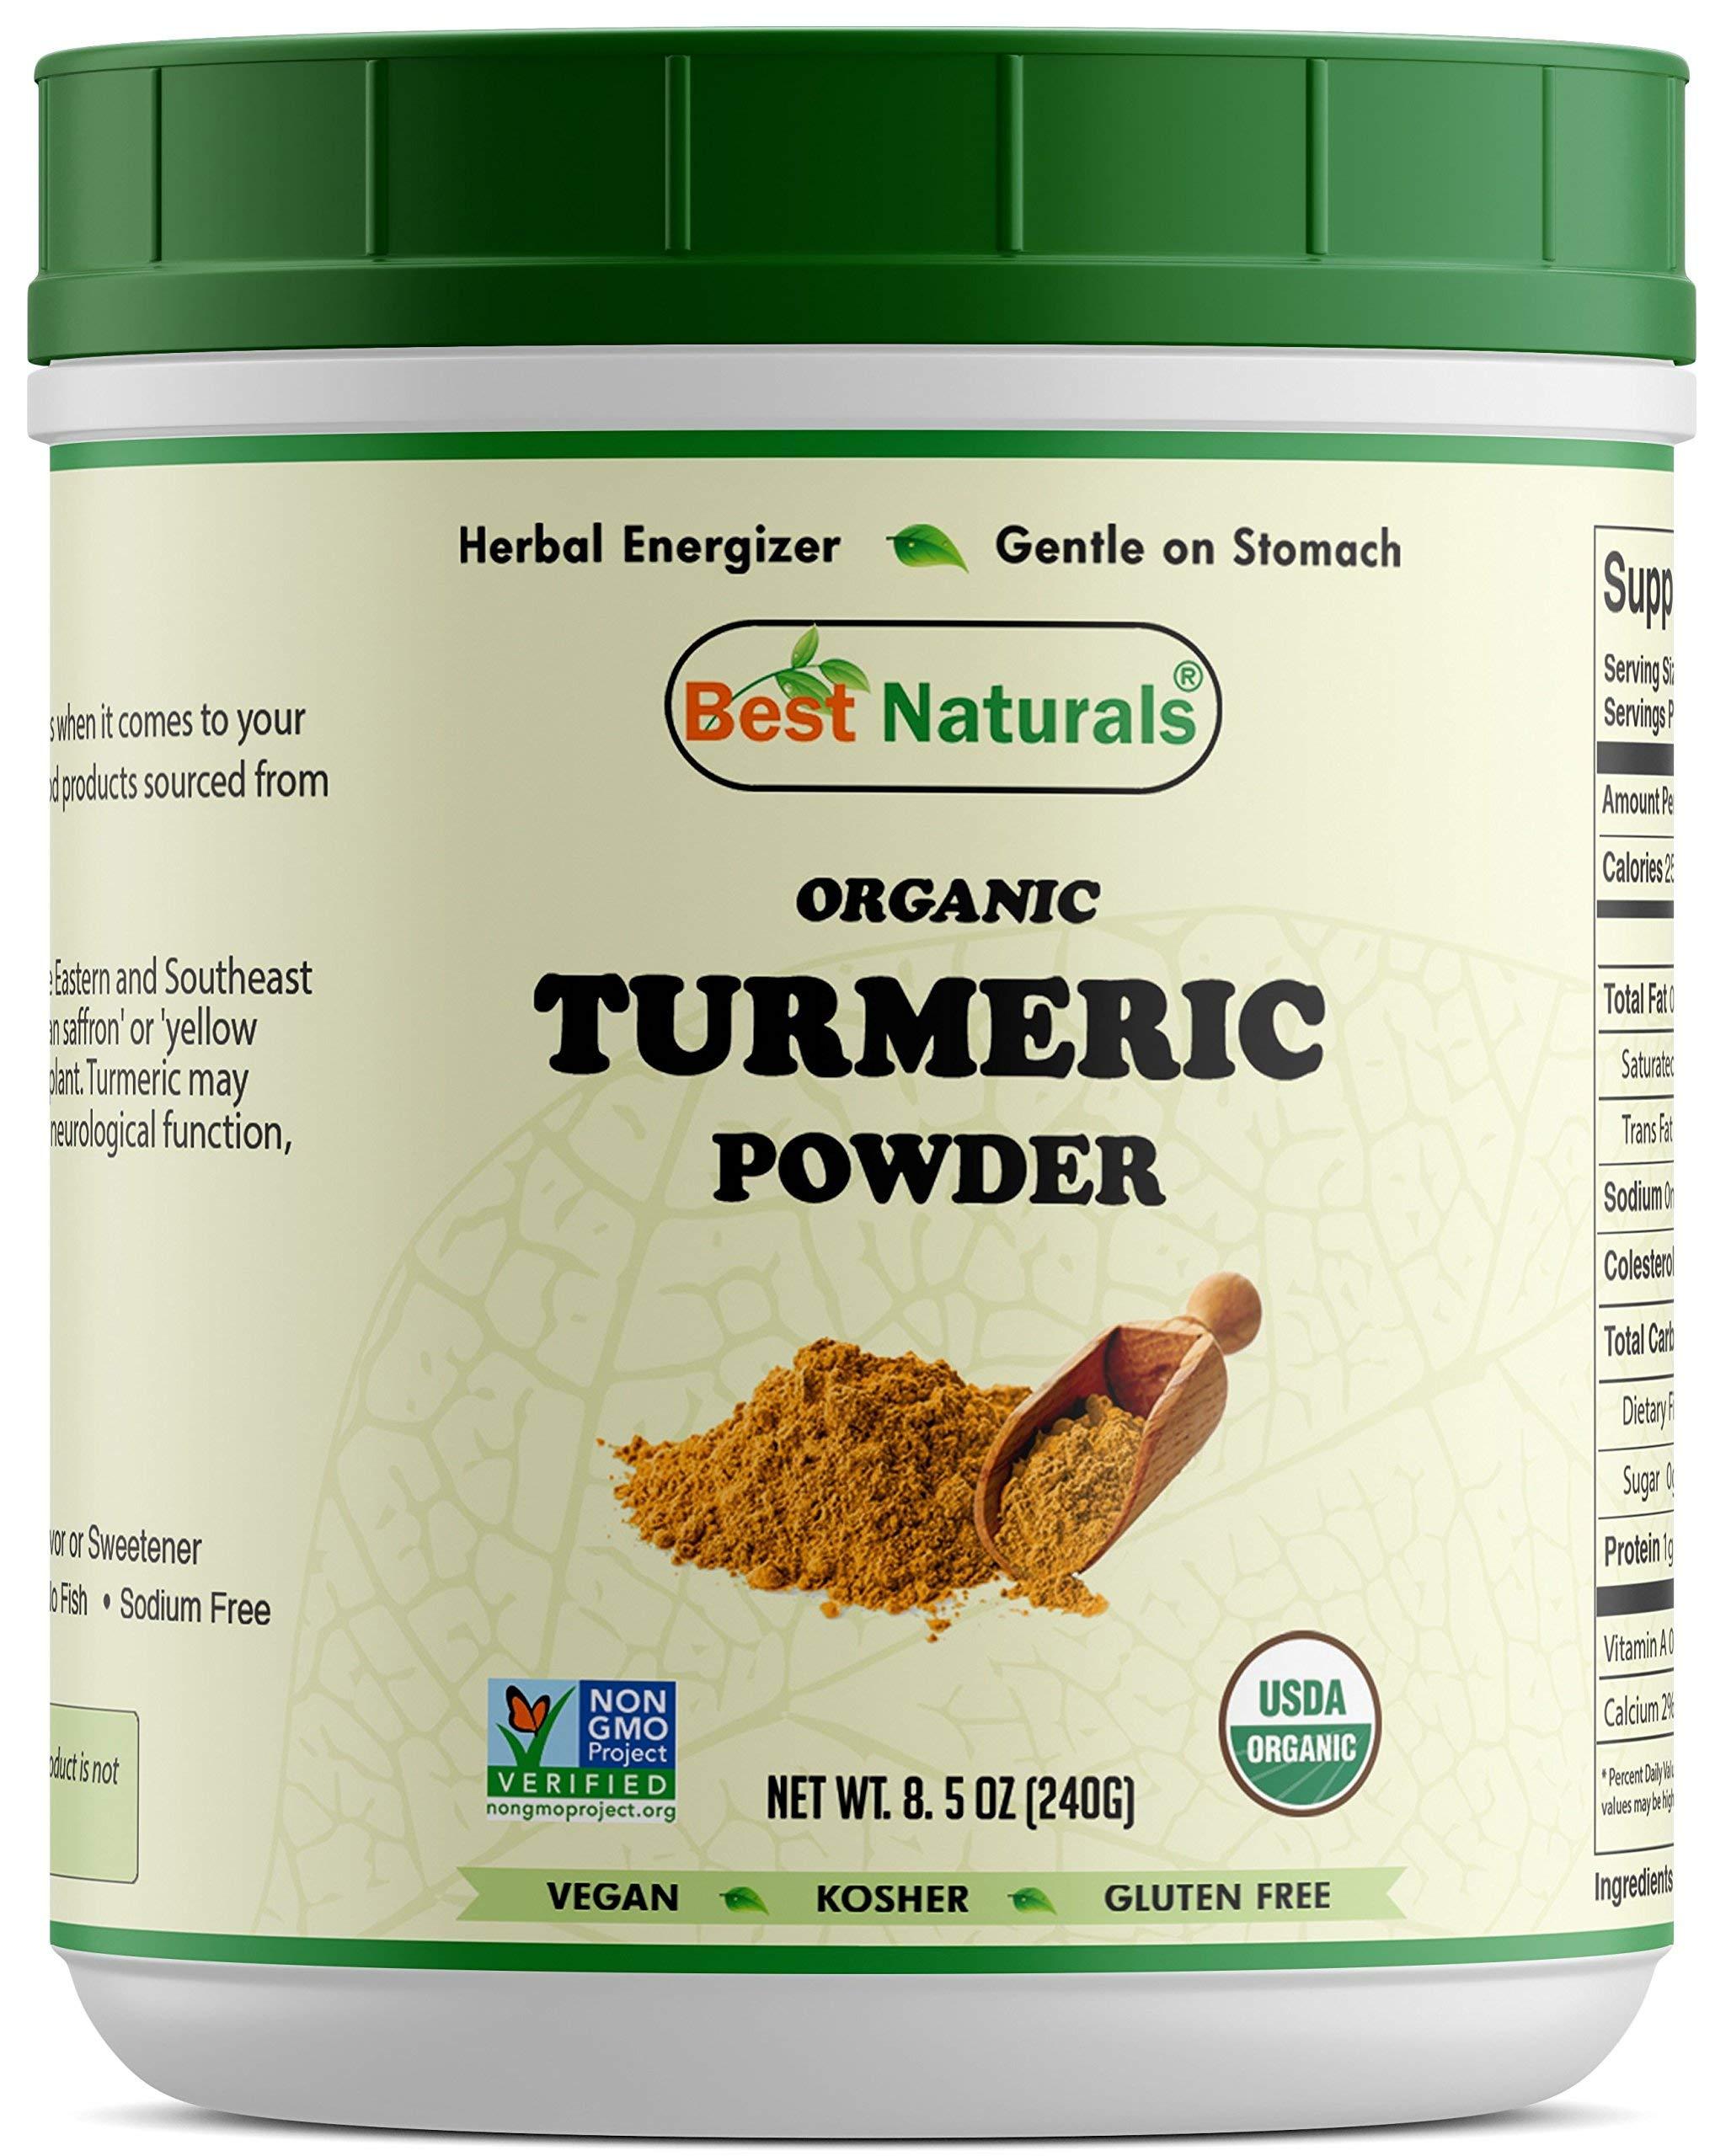 Best Naturals Certified Organic Turmeric Curcumin Powder 8.5 OZ (240 Gram), Non-GMO Project Verified & USDA Certified Organic